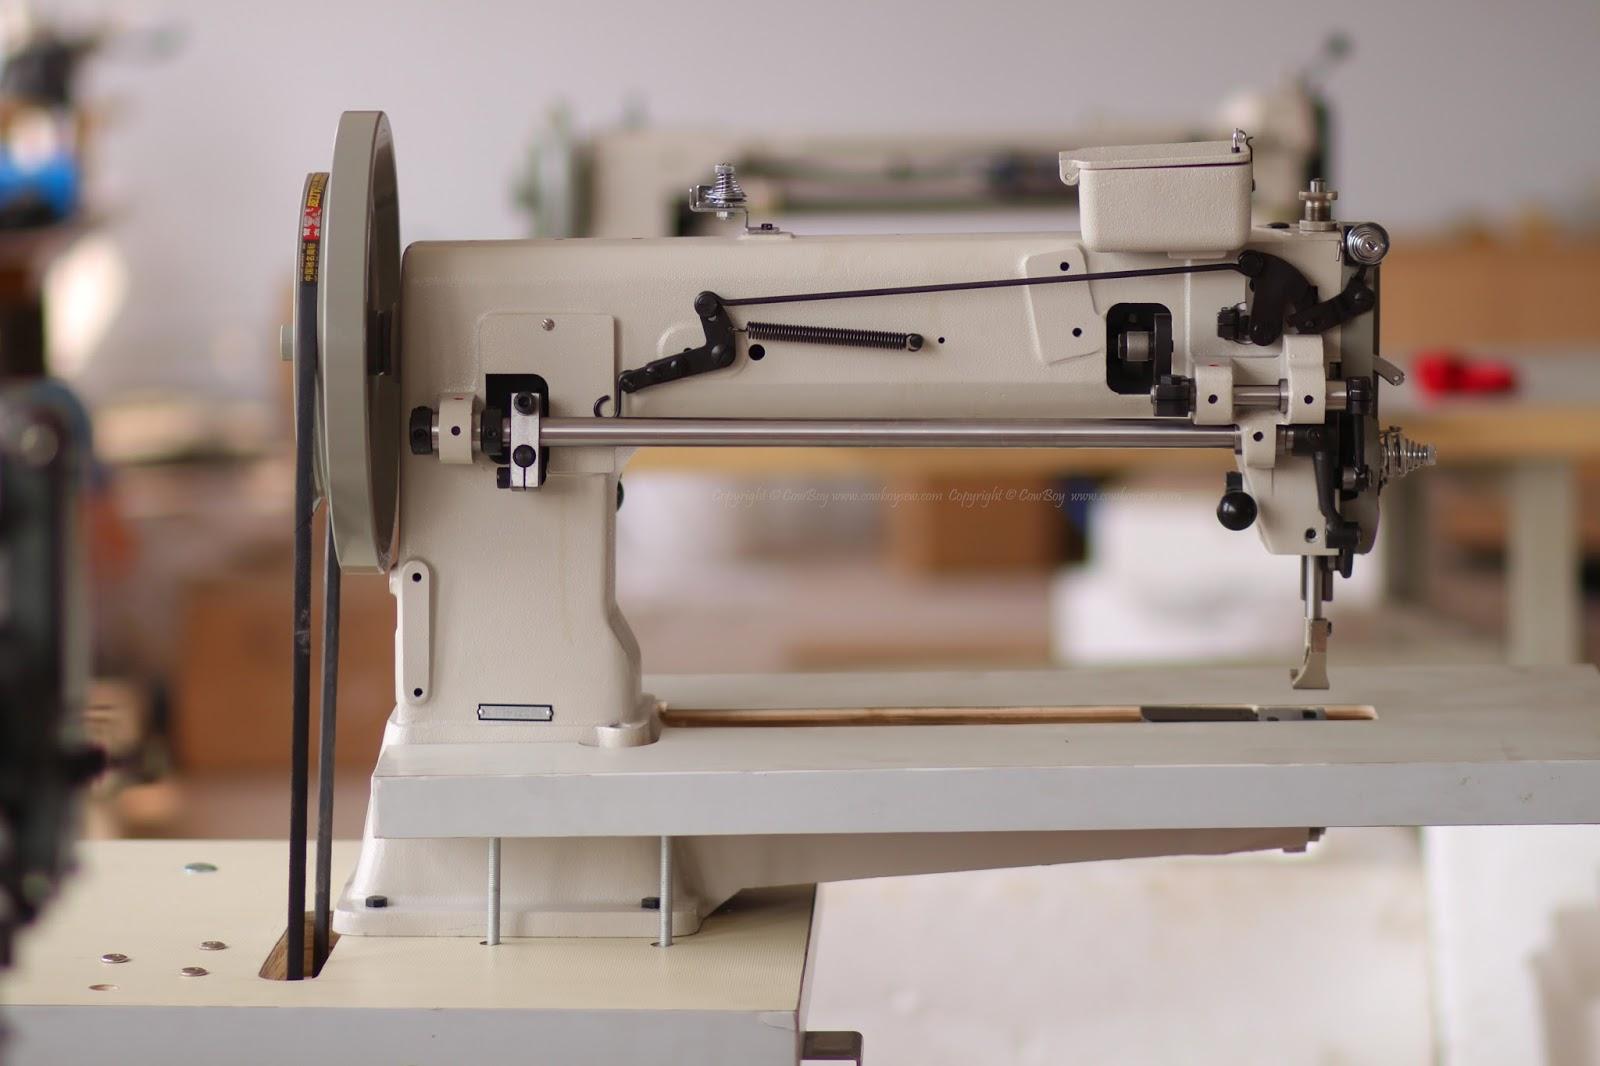 cowboy 4500 sewing machine